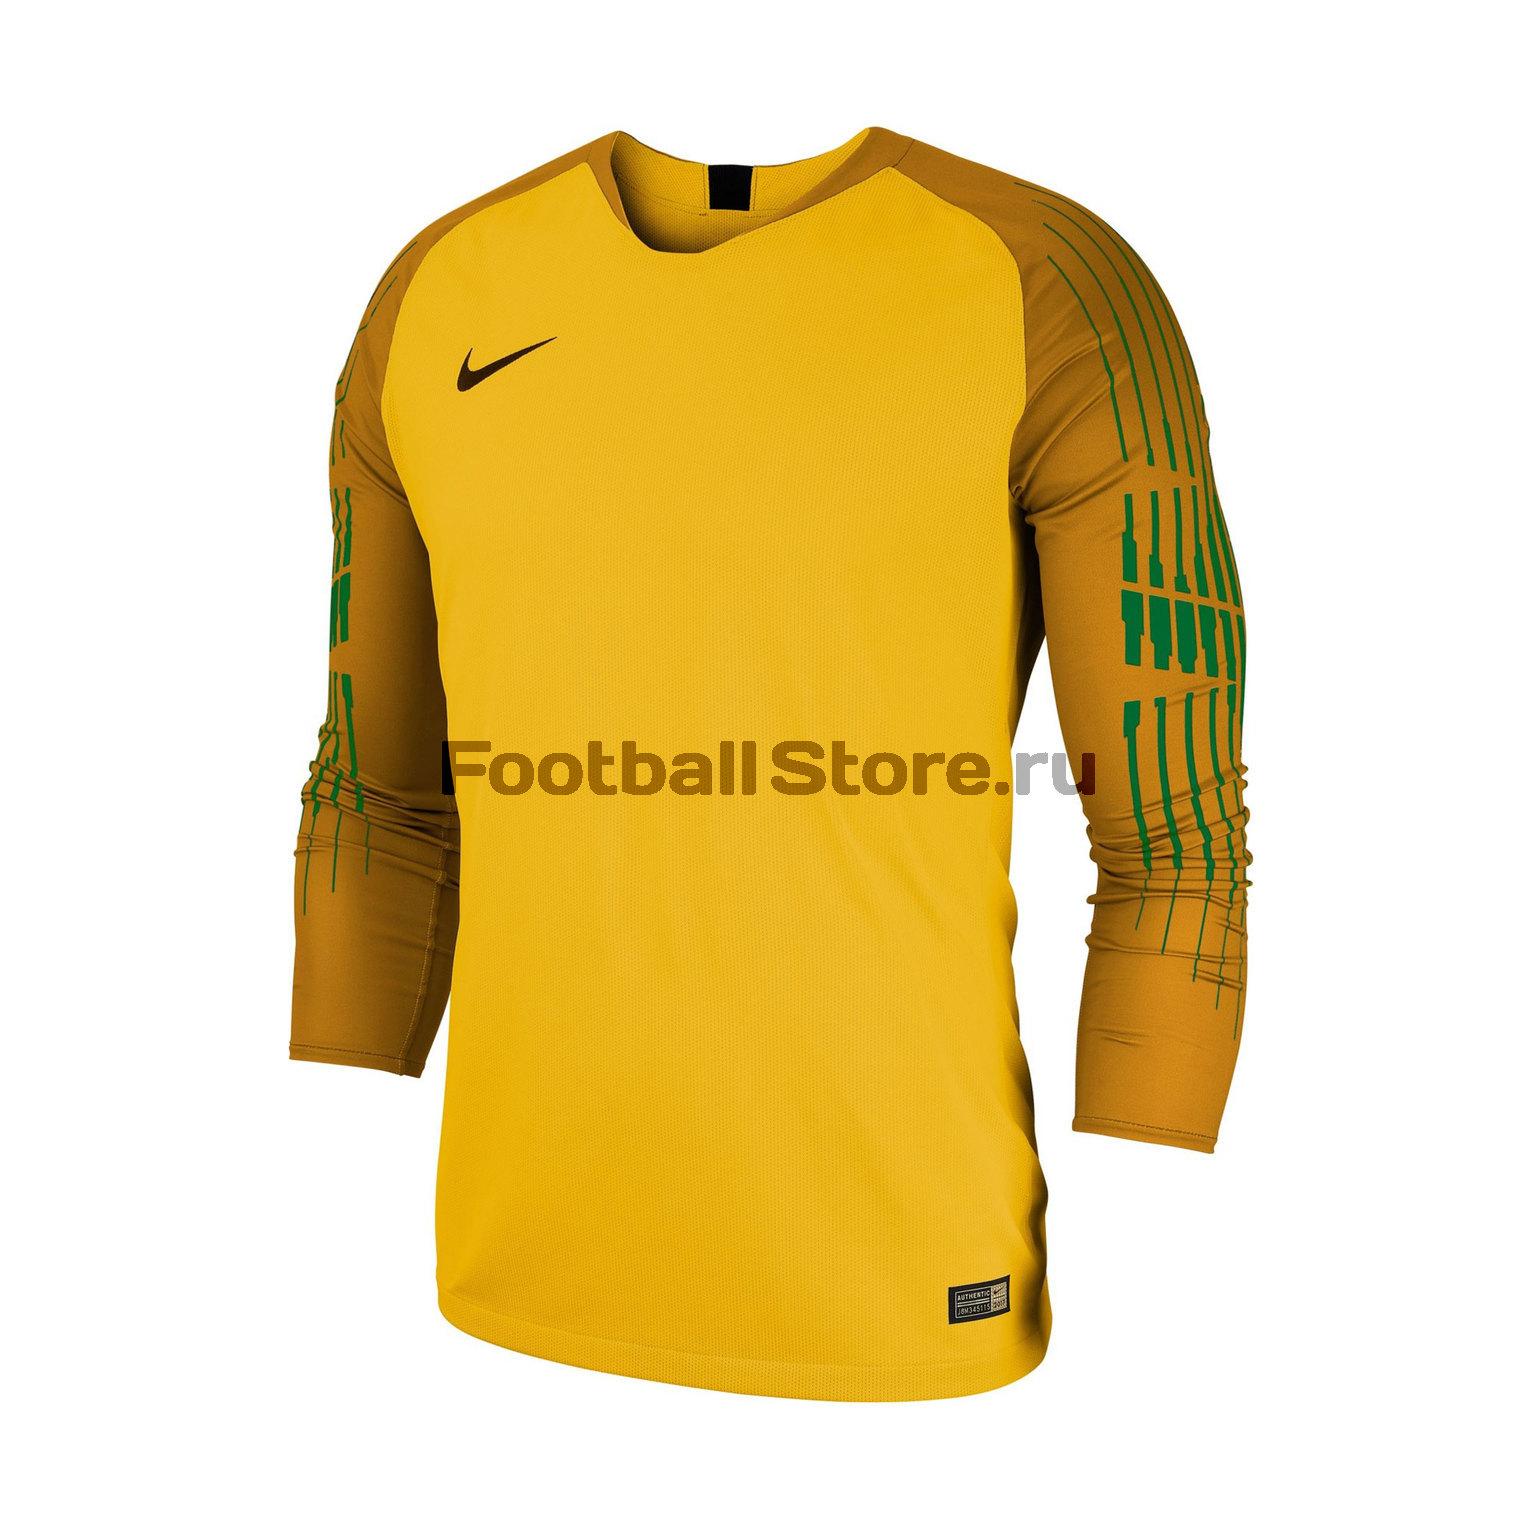 Вратарская футболка Nike Gardien II GK 898043-719